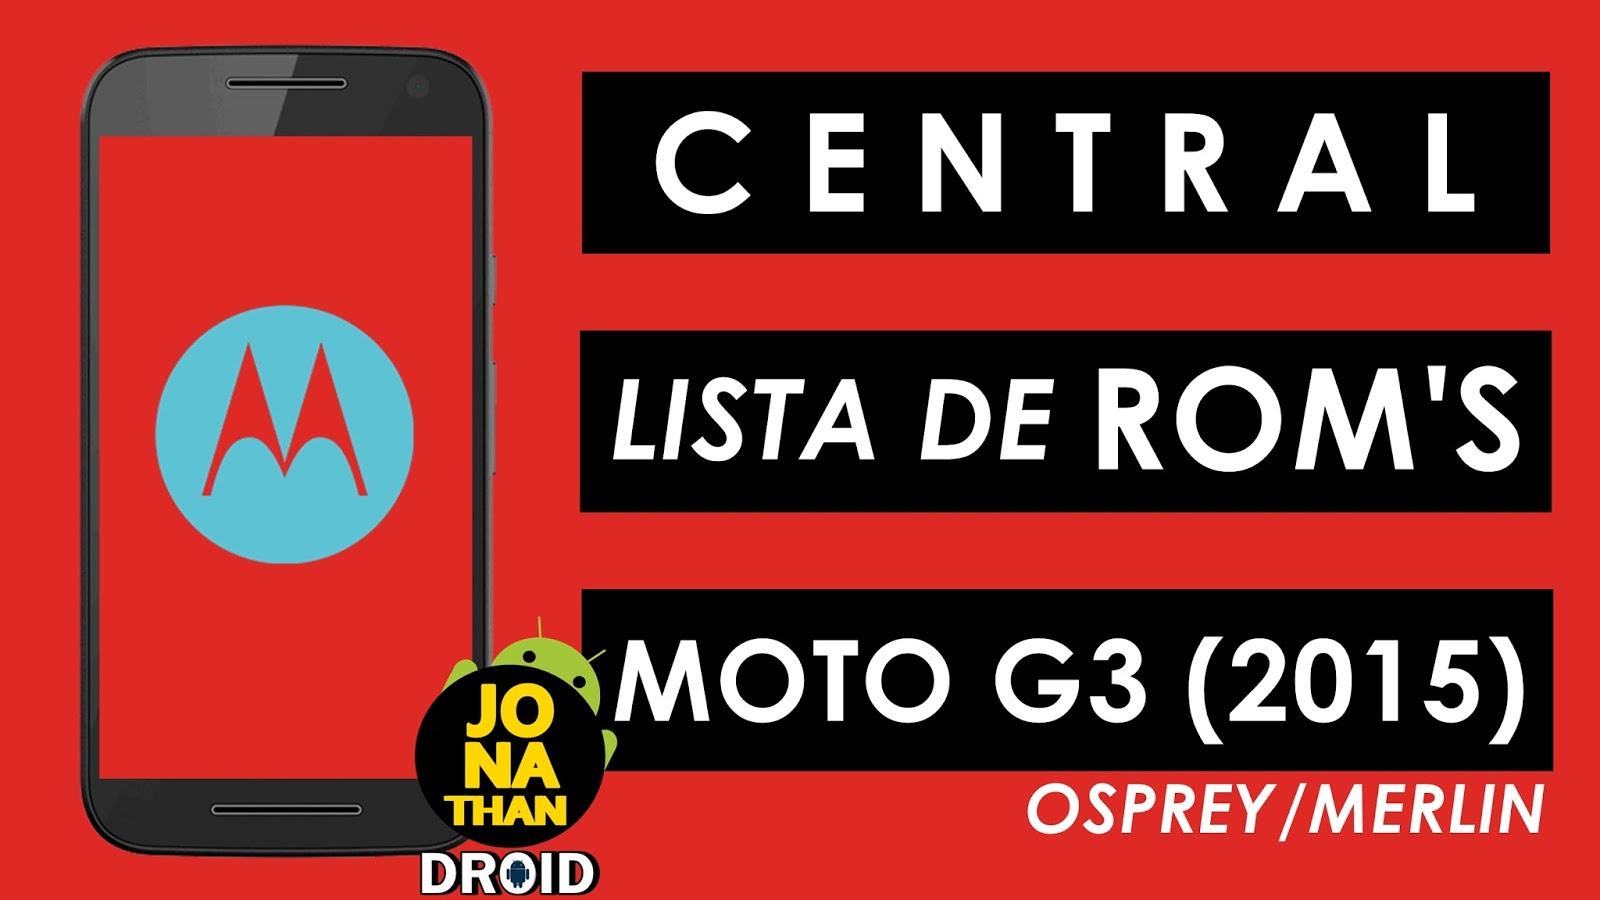 CENTRAL   LISTA DE ROMS CUSTOMIZADAS PARA MOTO G3 (2015